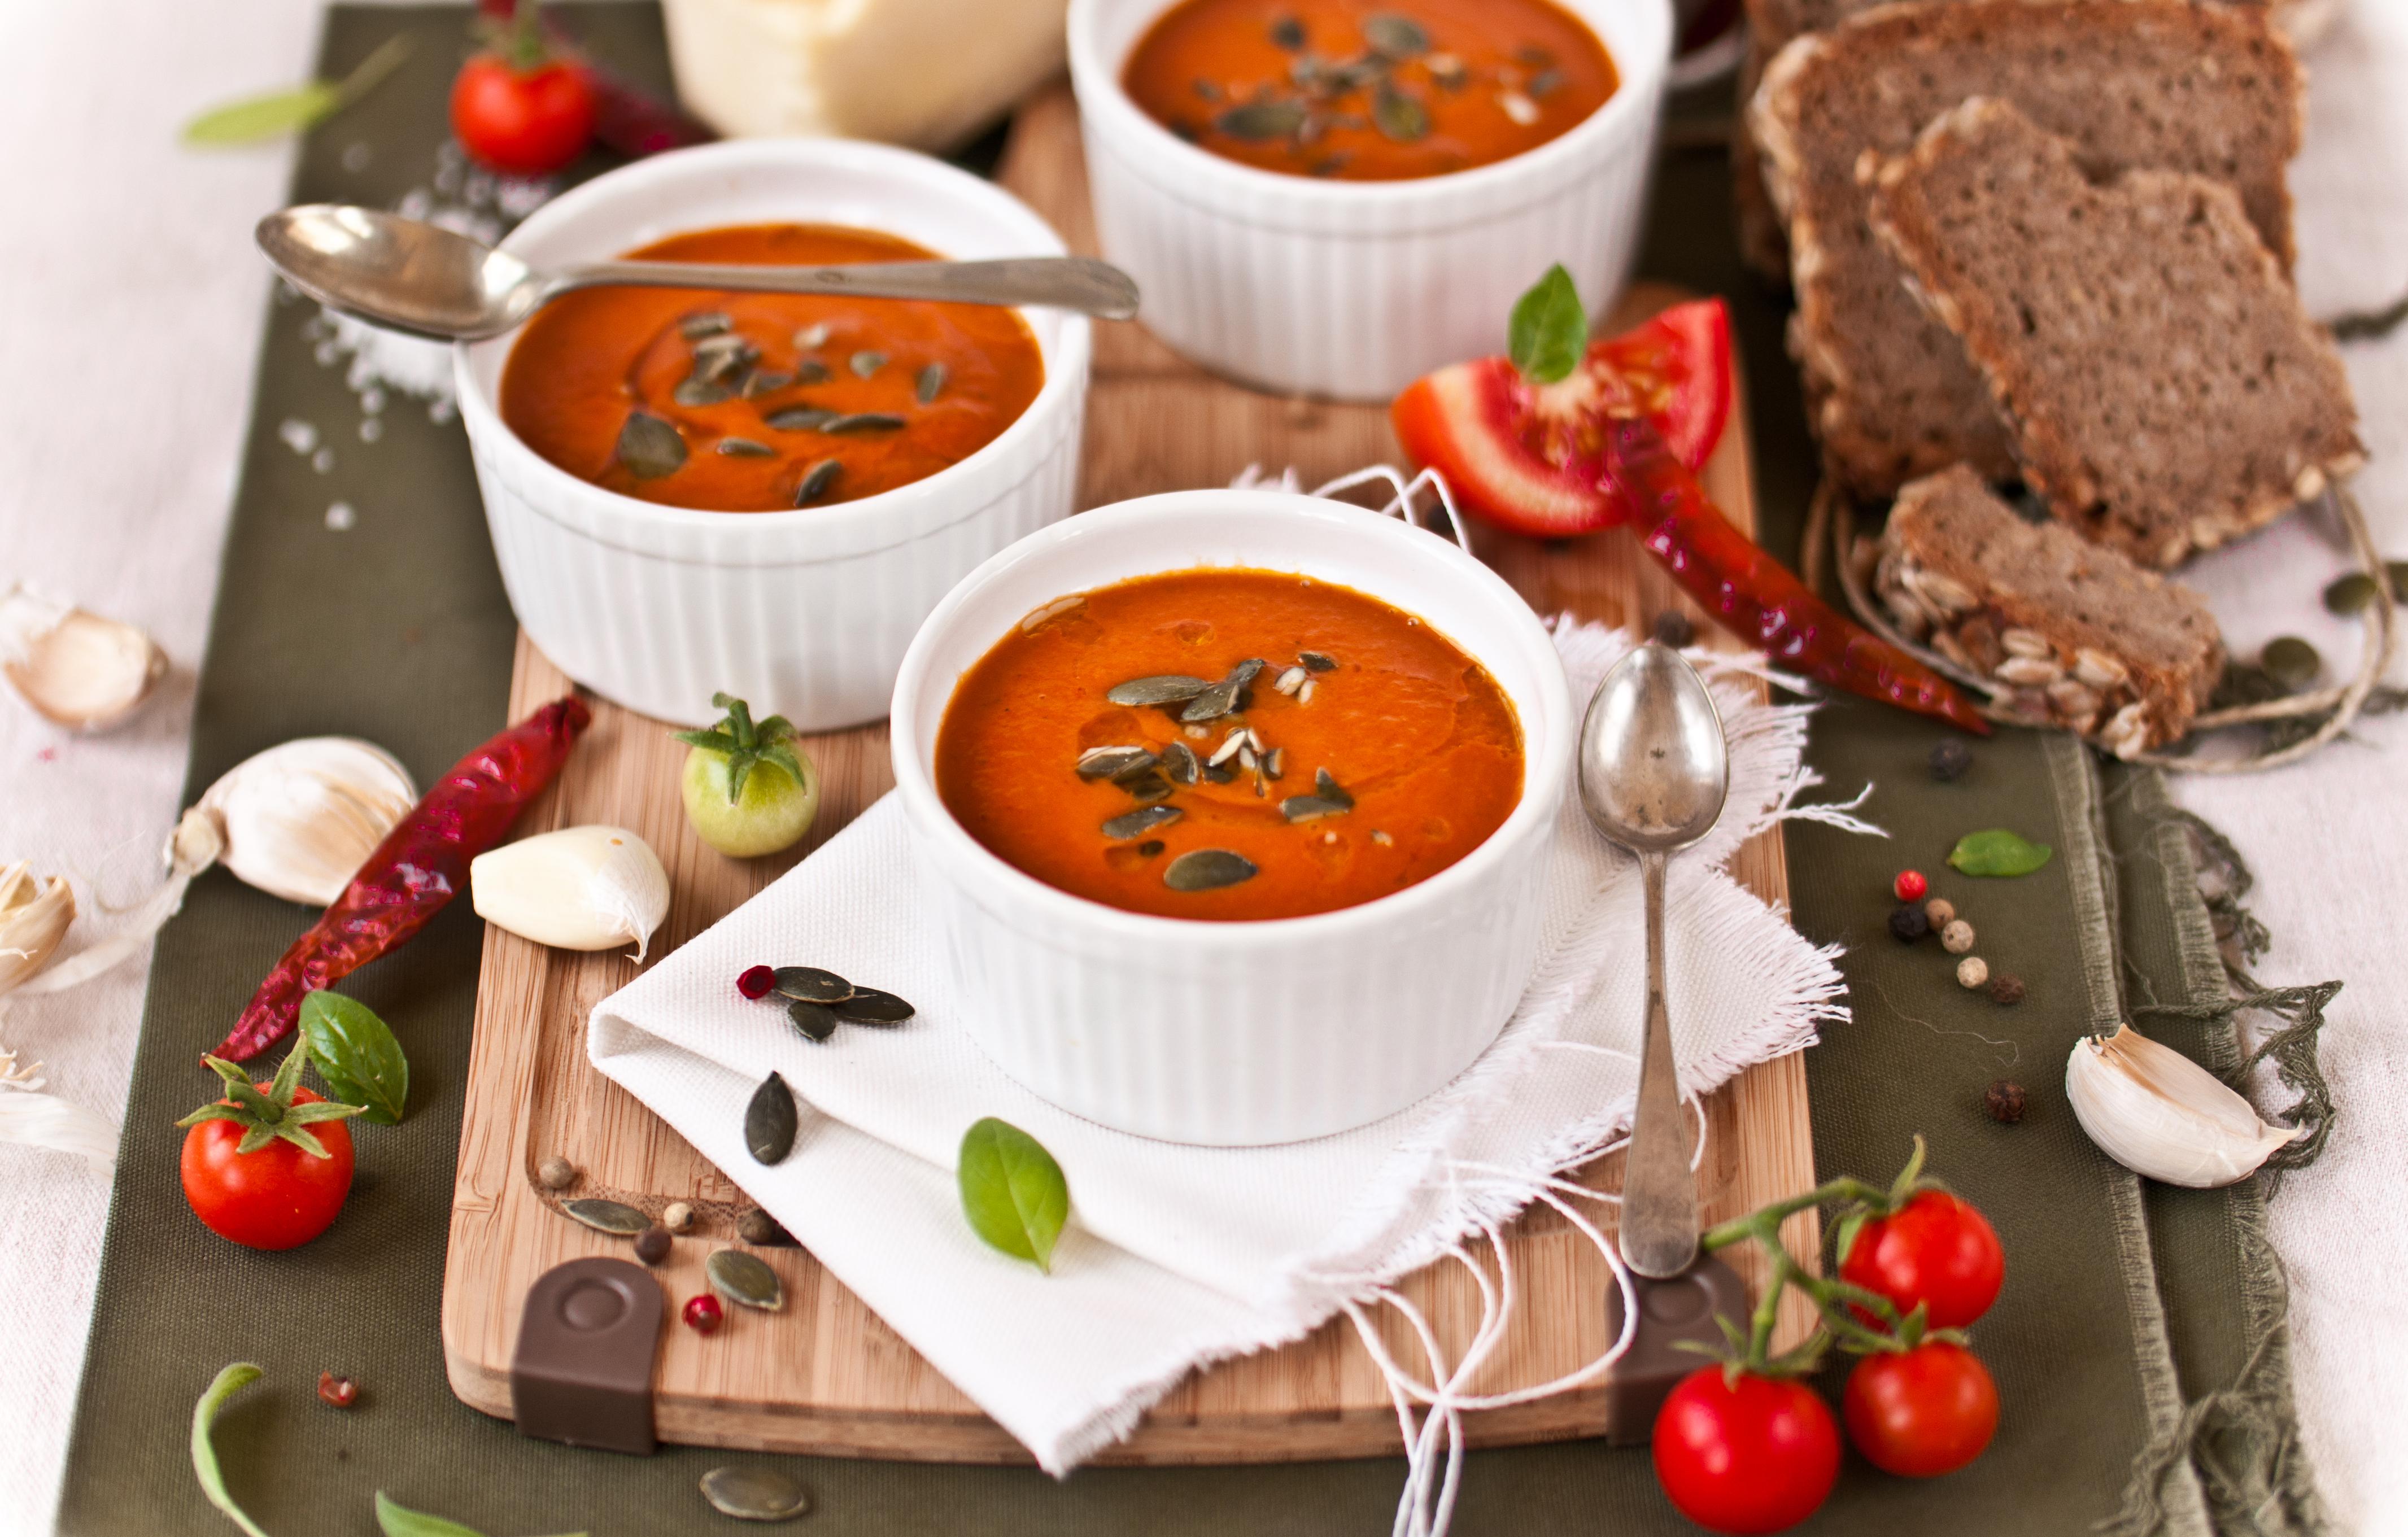 Thick, Roasted Tomato & Harissa Soup Recipe